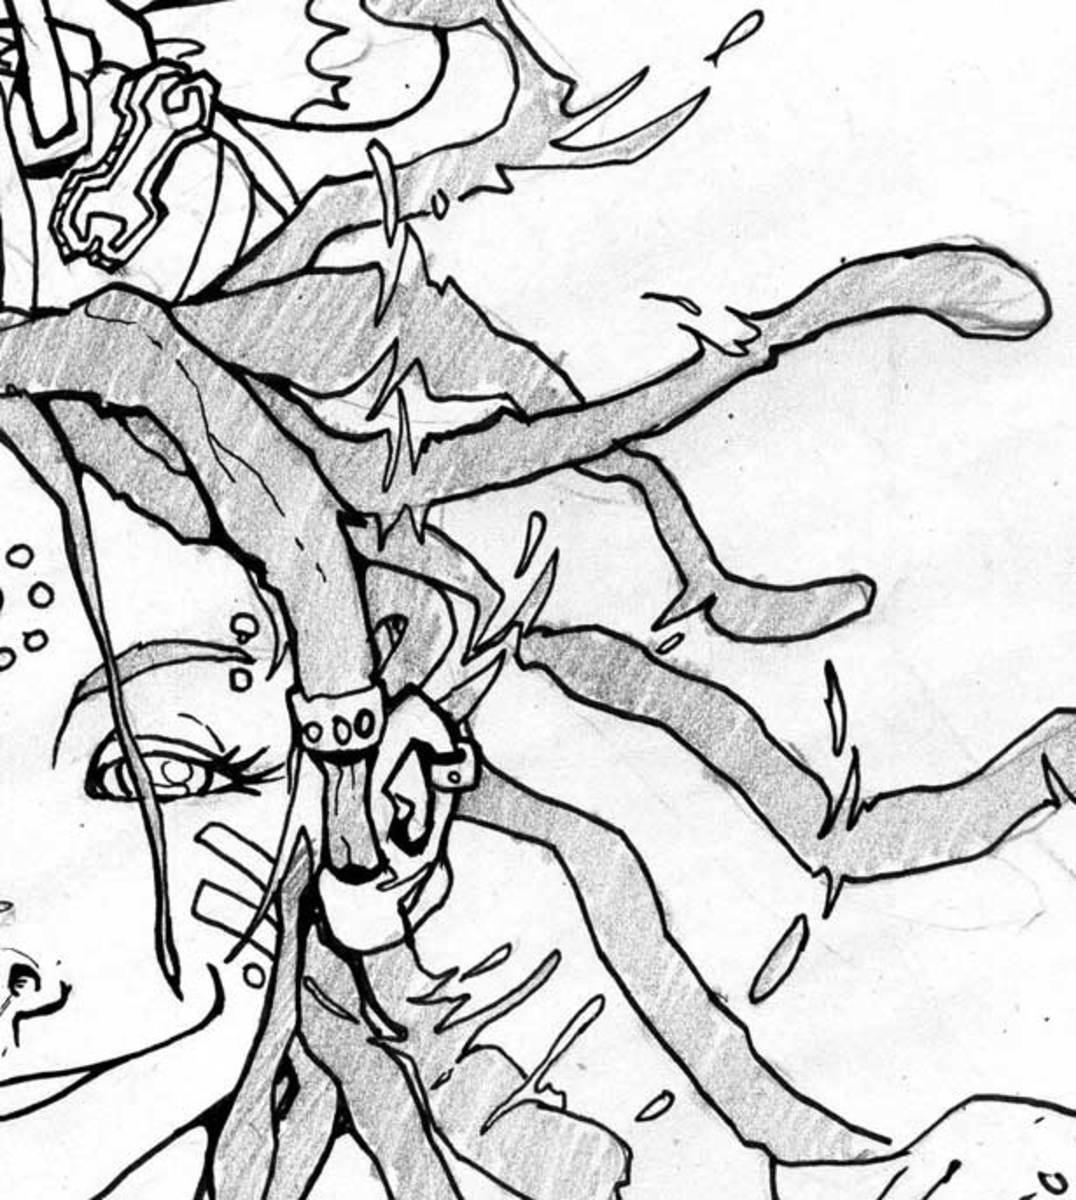 Spannered-Chapter-05-illustration-detail